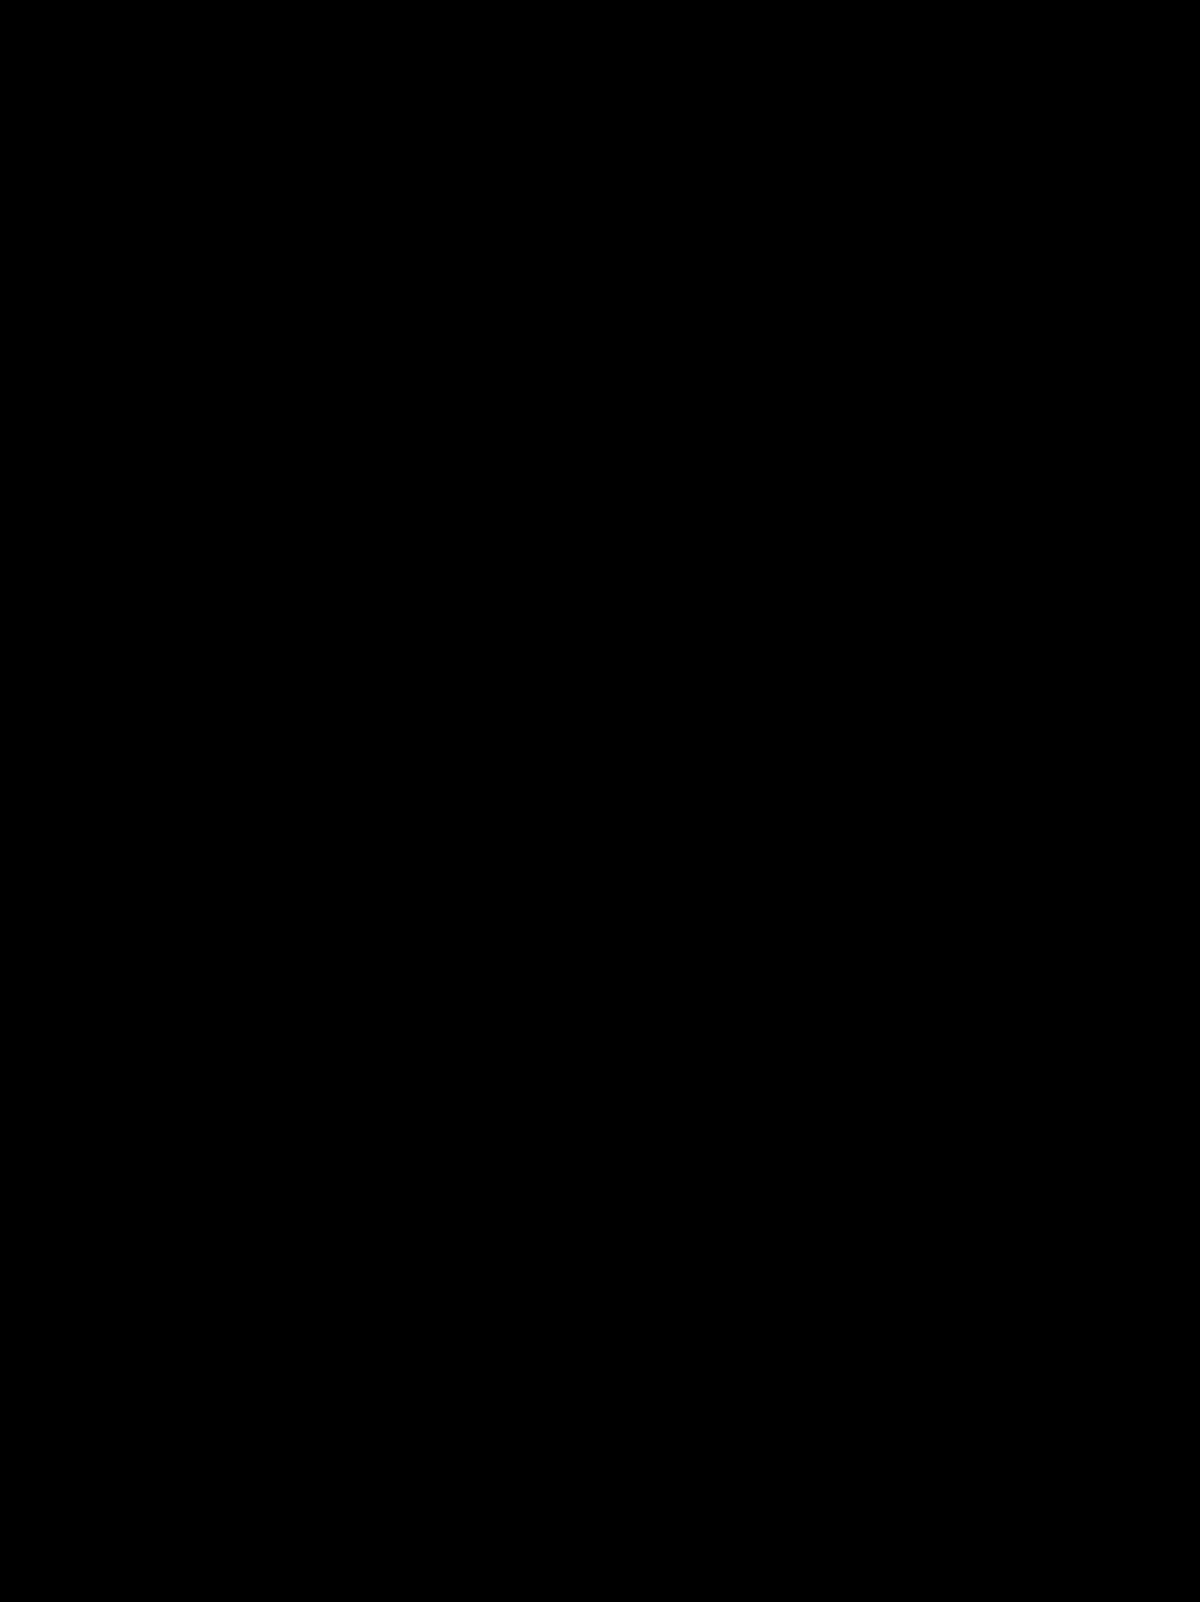 Sacerdotes monjas iglesia catolica clipart black and white vector download Orden de los Cartujos - Wikipedia, la enciclopedia libre vector download